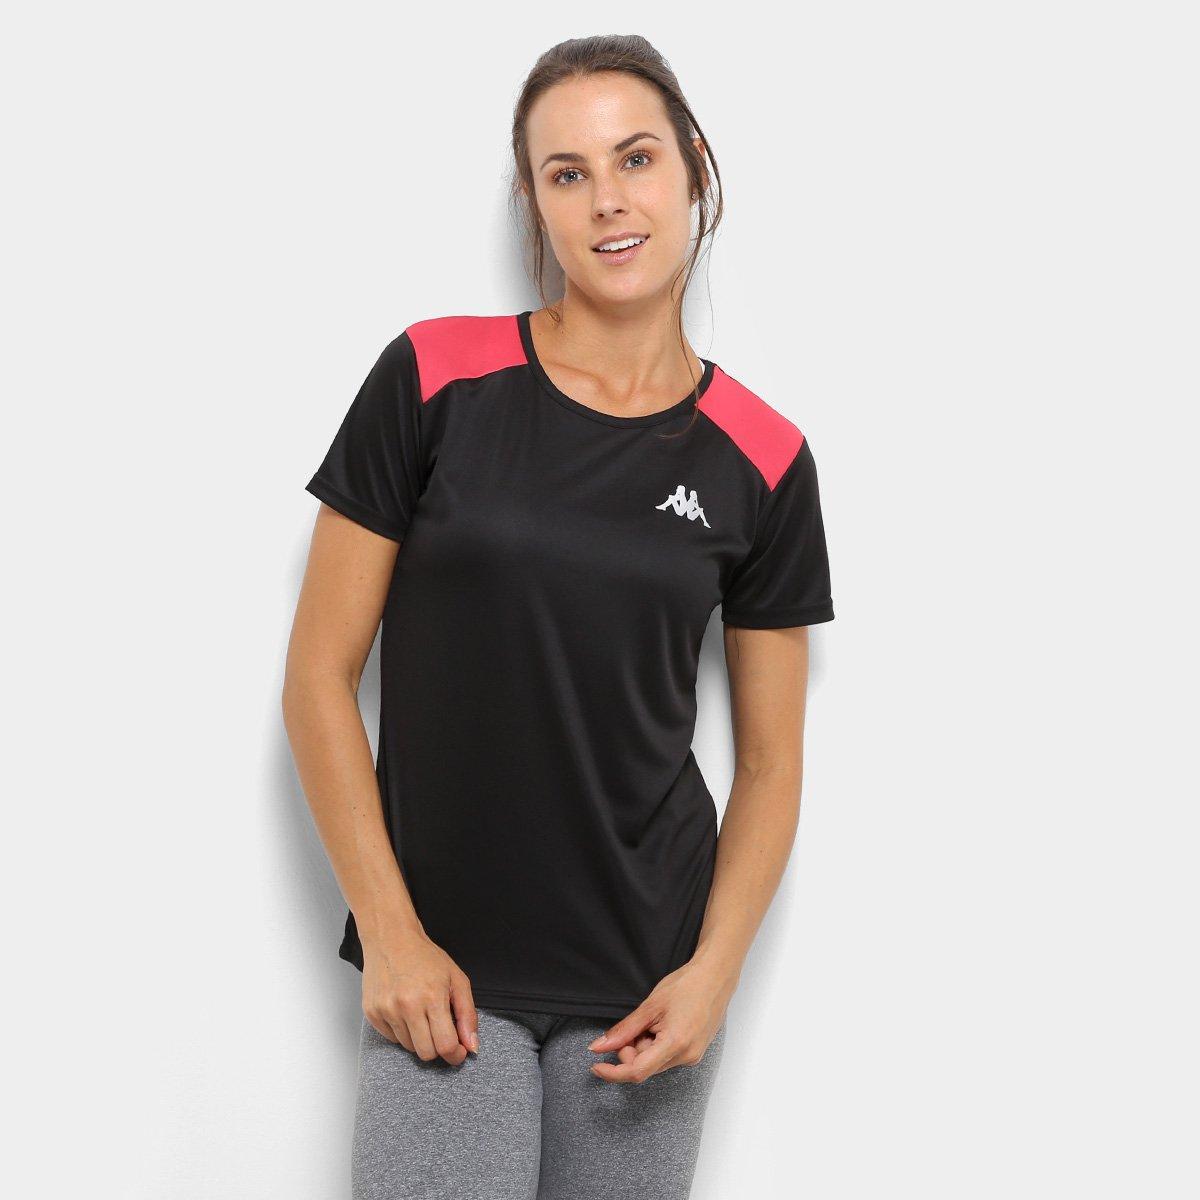 Camiseta Kappa Fluid Feminino. undefined e642ea6f86096